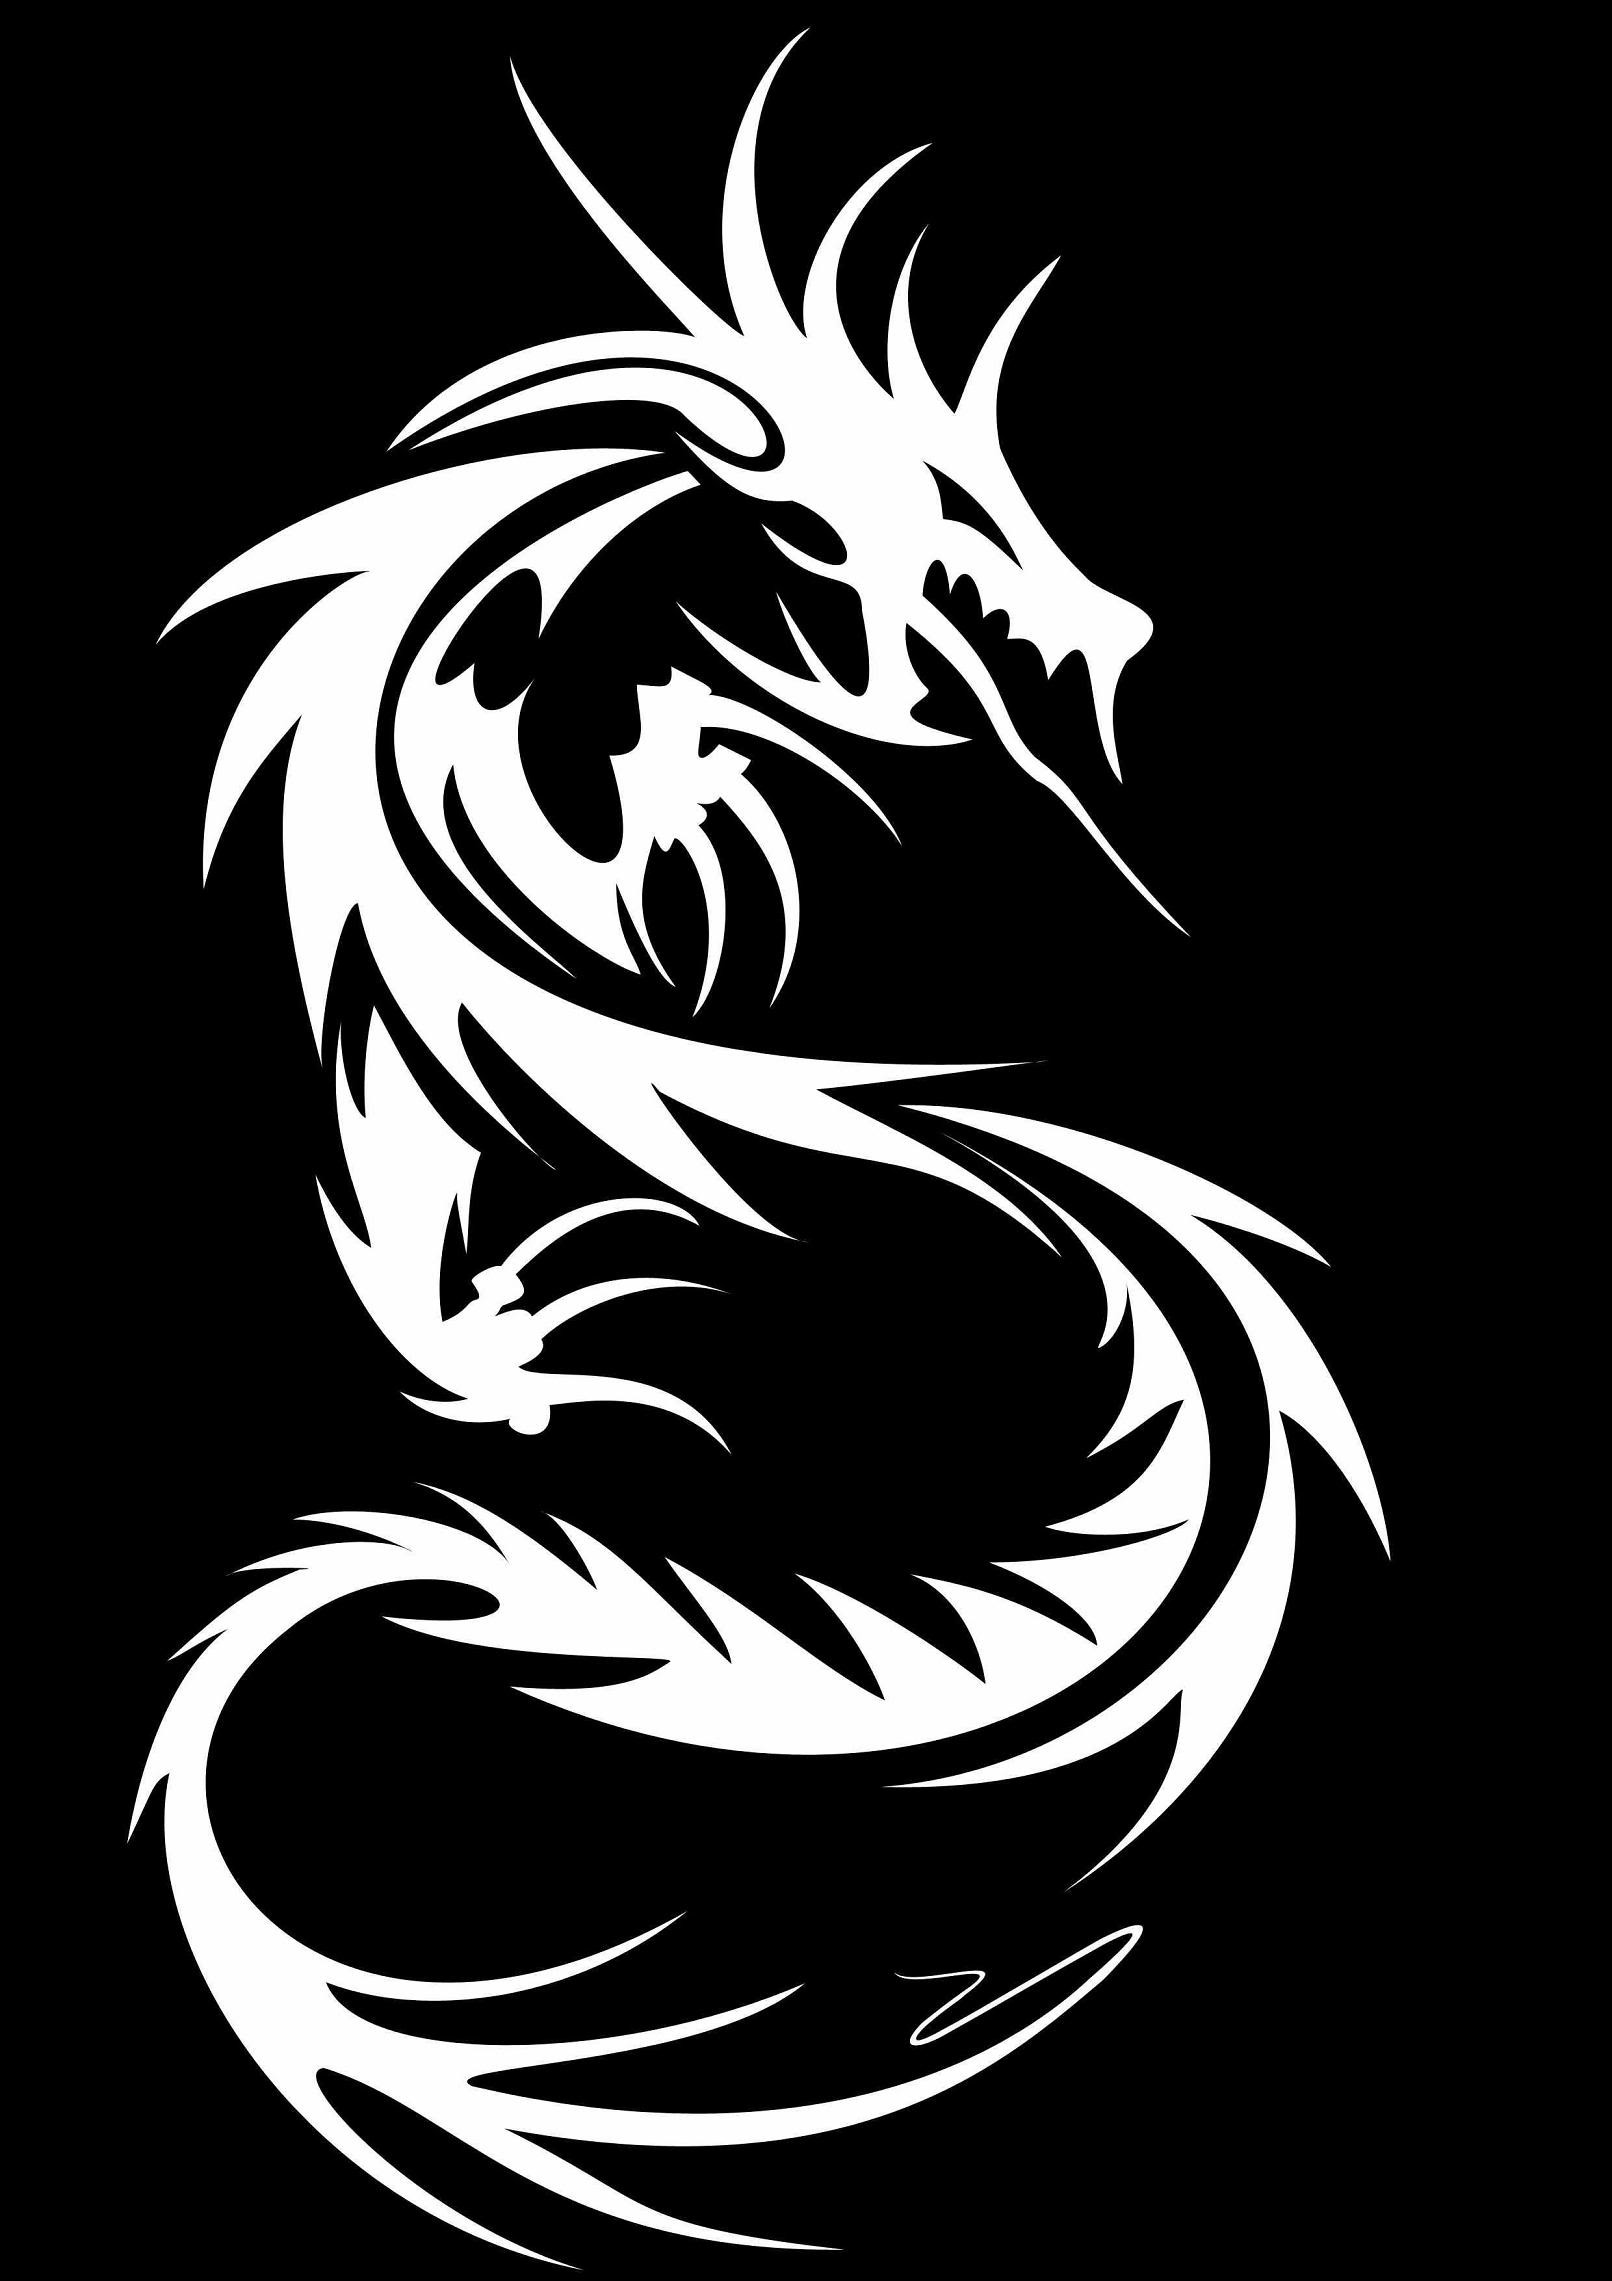 Res: 1612x2281, #9015 tribal dragon wallpaper